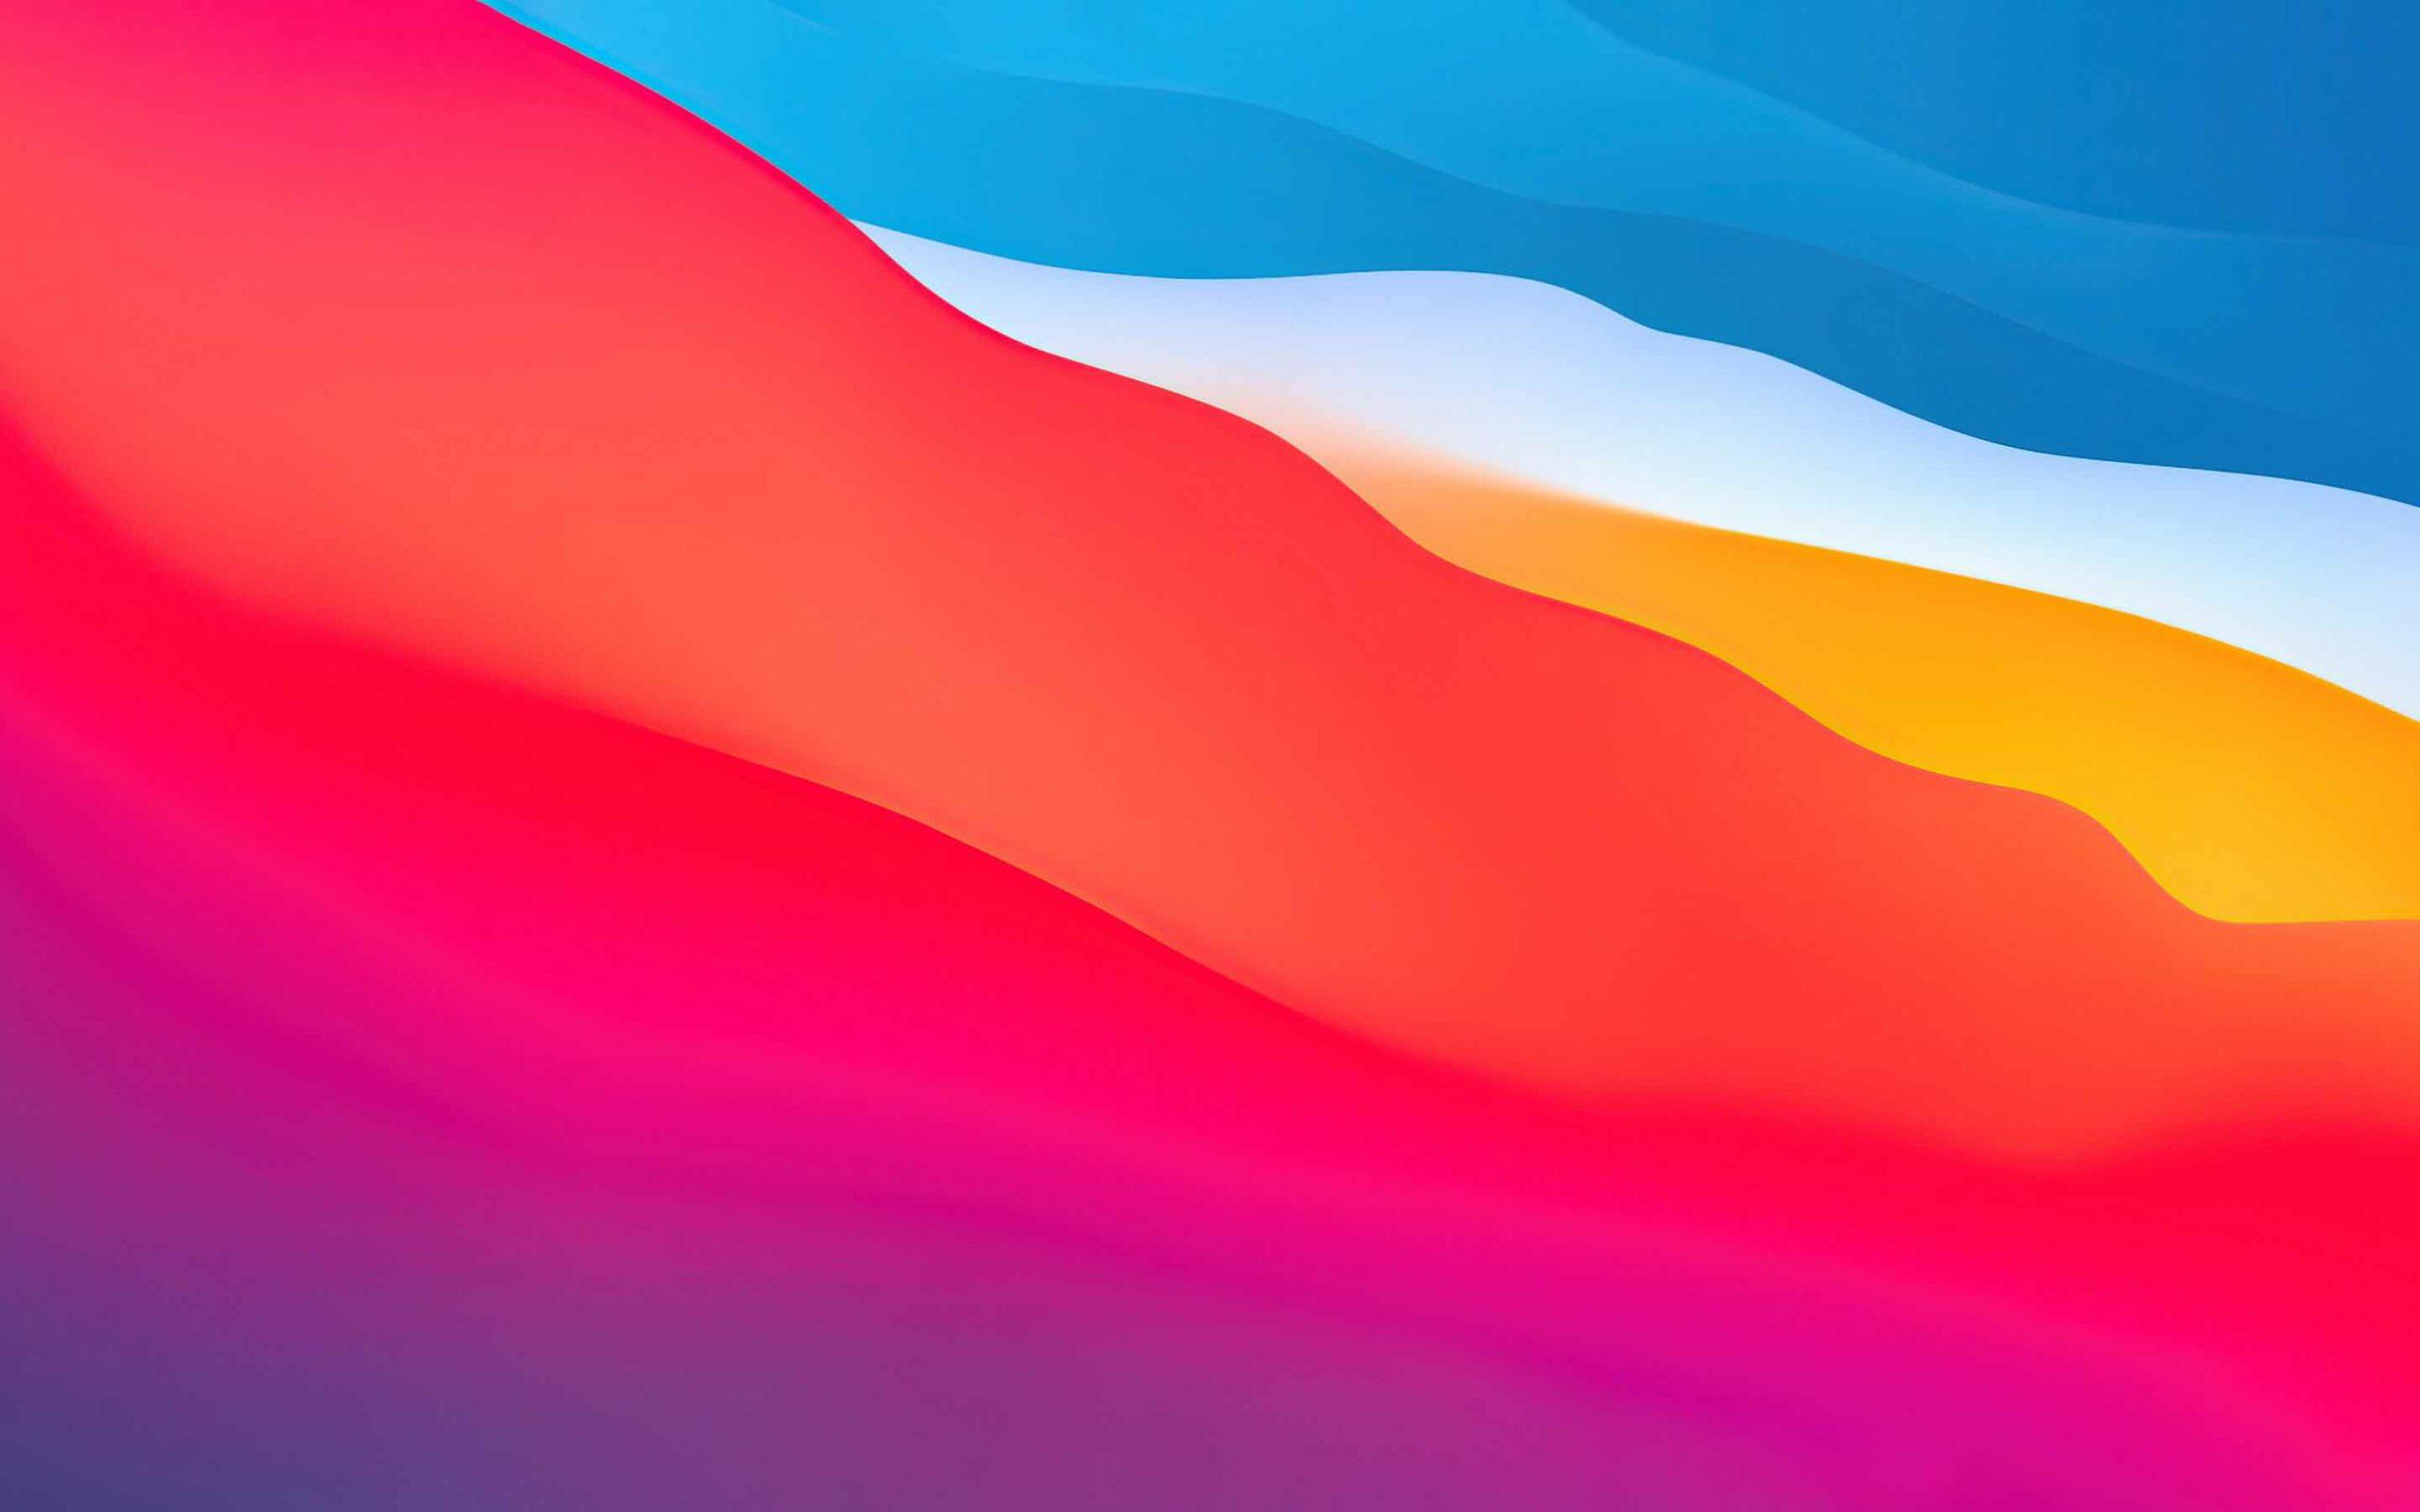 Hình nền Macbook Big Sur - Gradients